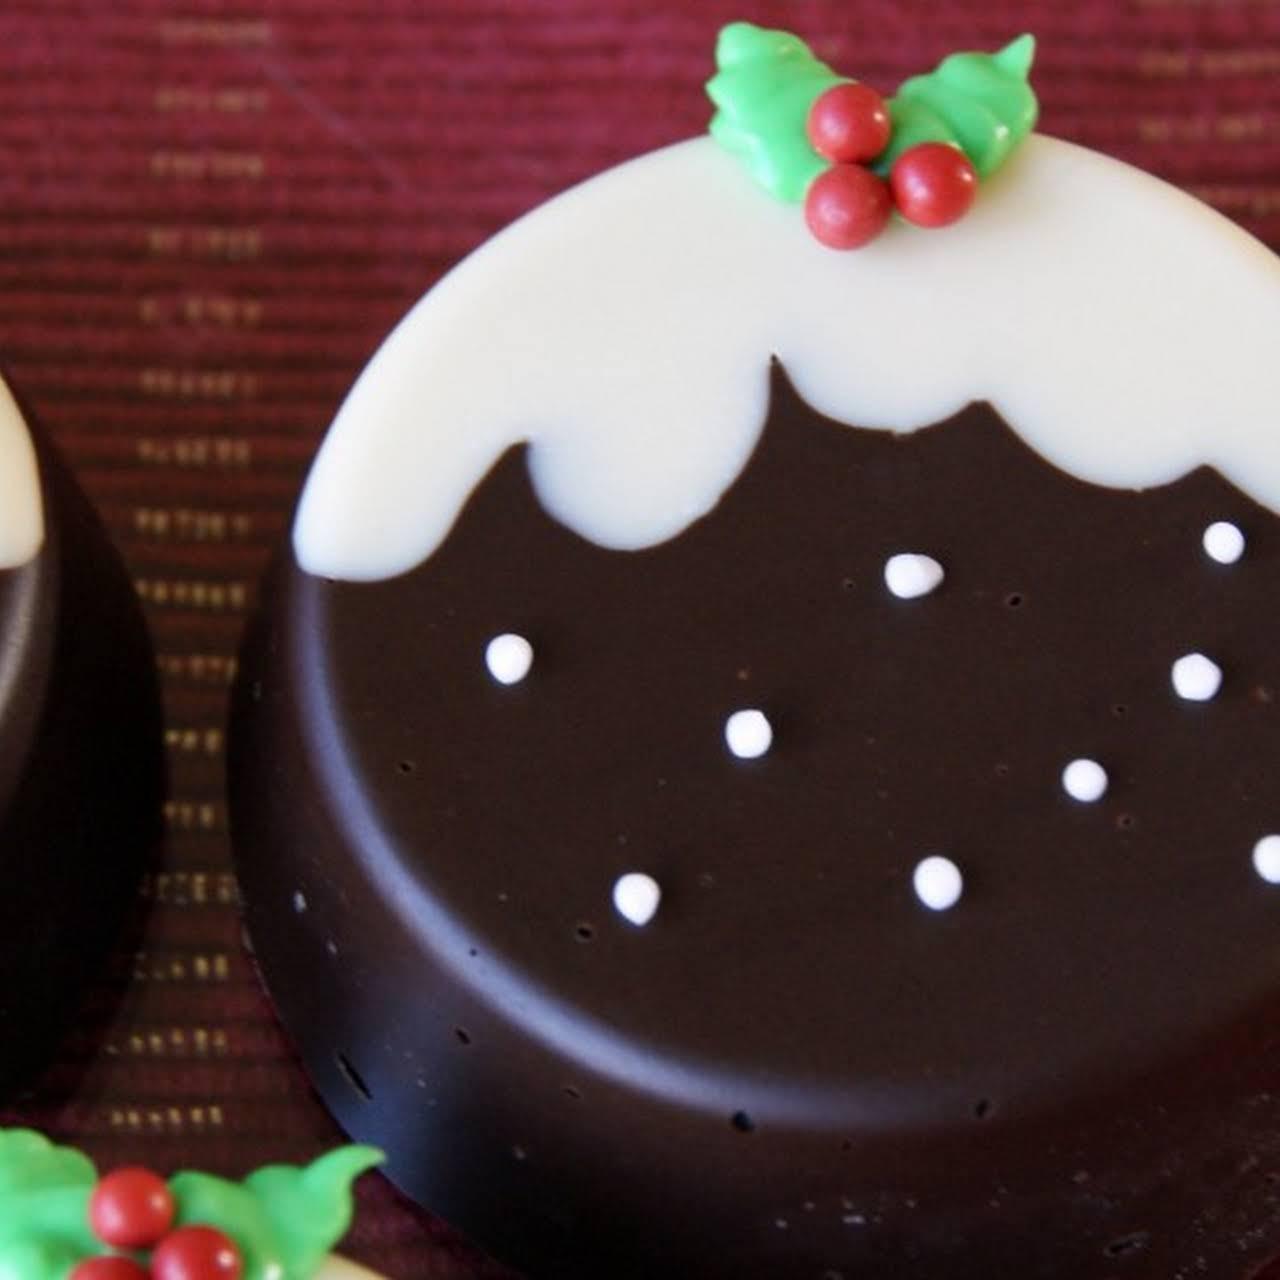 Day 2 – Christmas Pudding Chocolate Covered Oreos